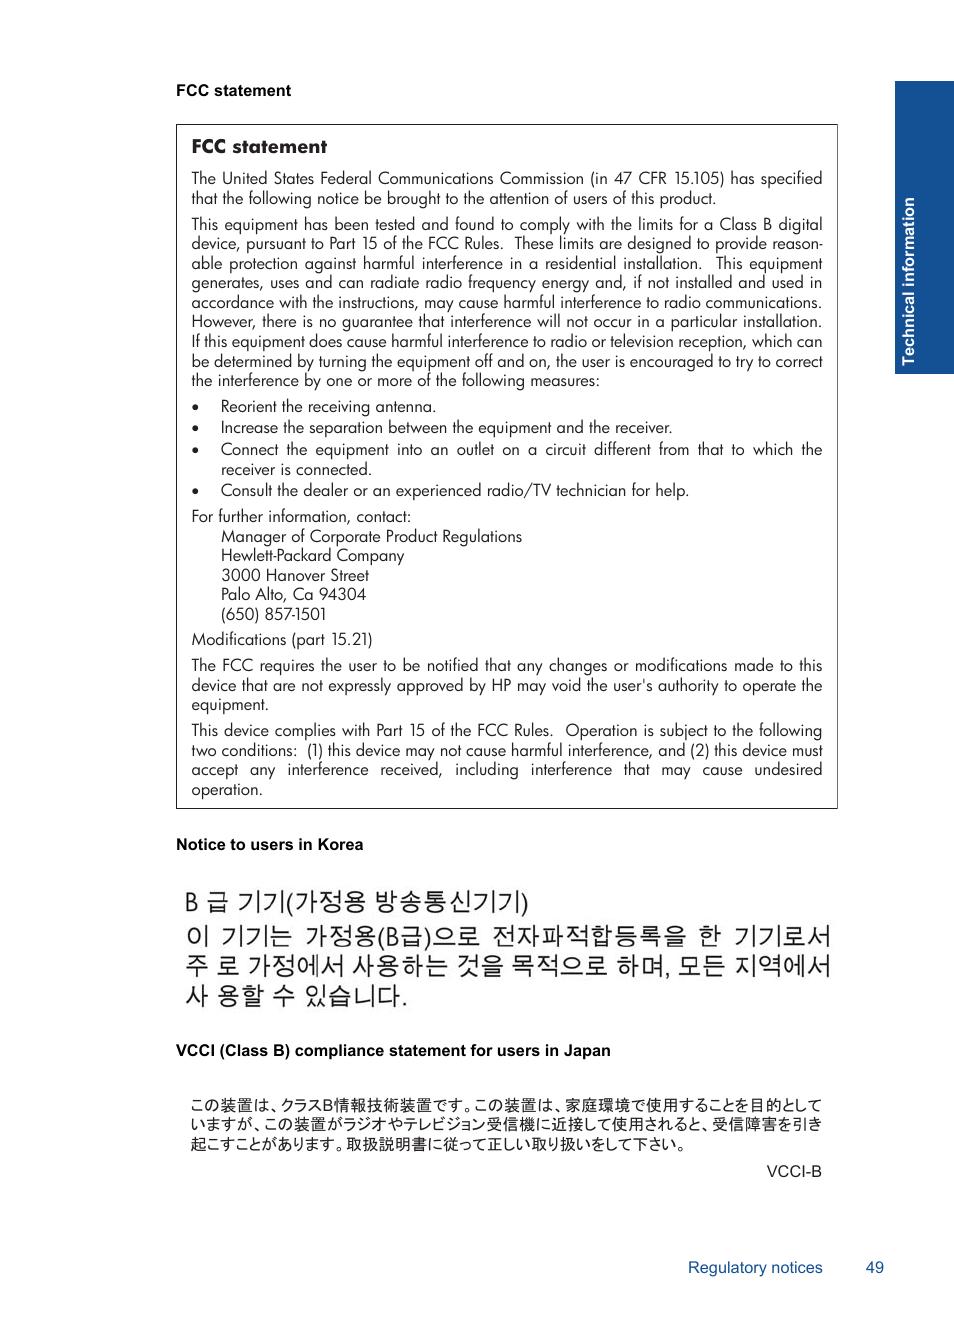 Hp deskjet 2050 user manual | page 20 / 54 | original mode.